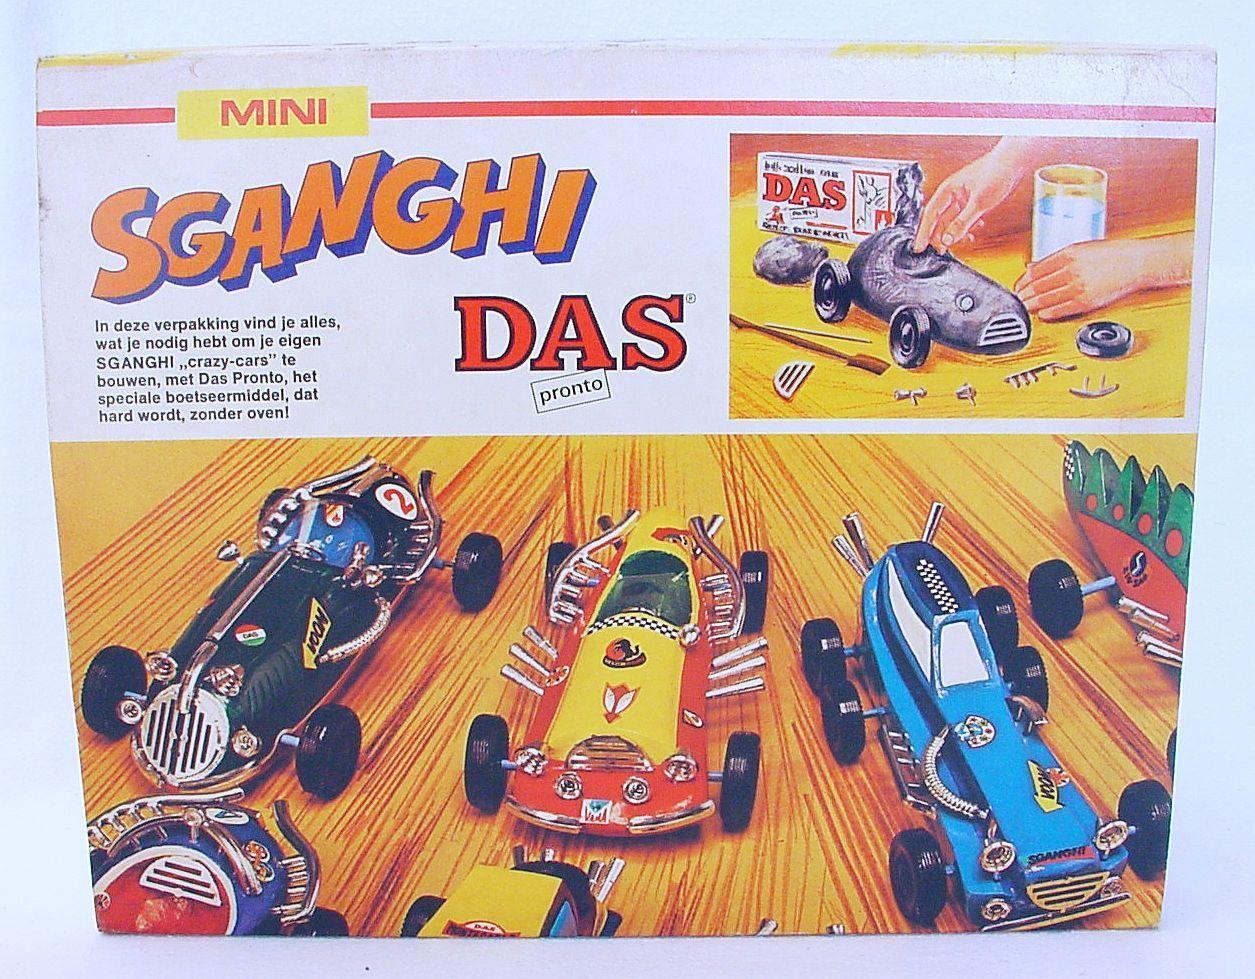 DAS Clay CRAZY-CARS Construction SGANGHI DEMOLITION DERBY Car MISB`70 VERY RARE